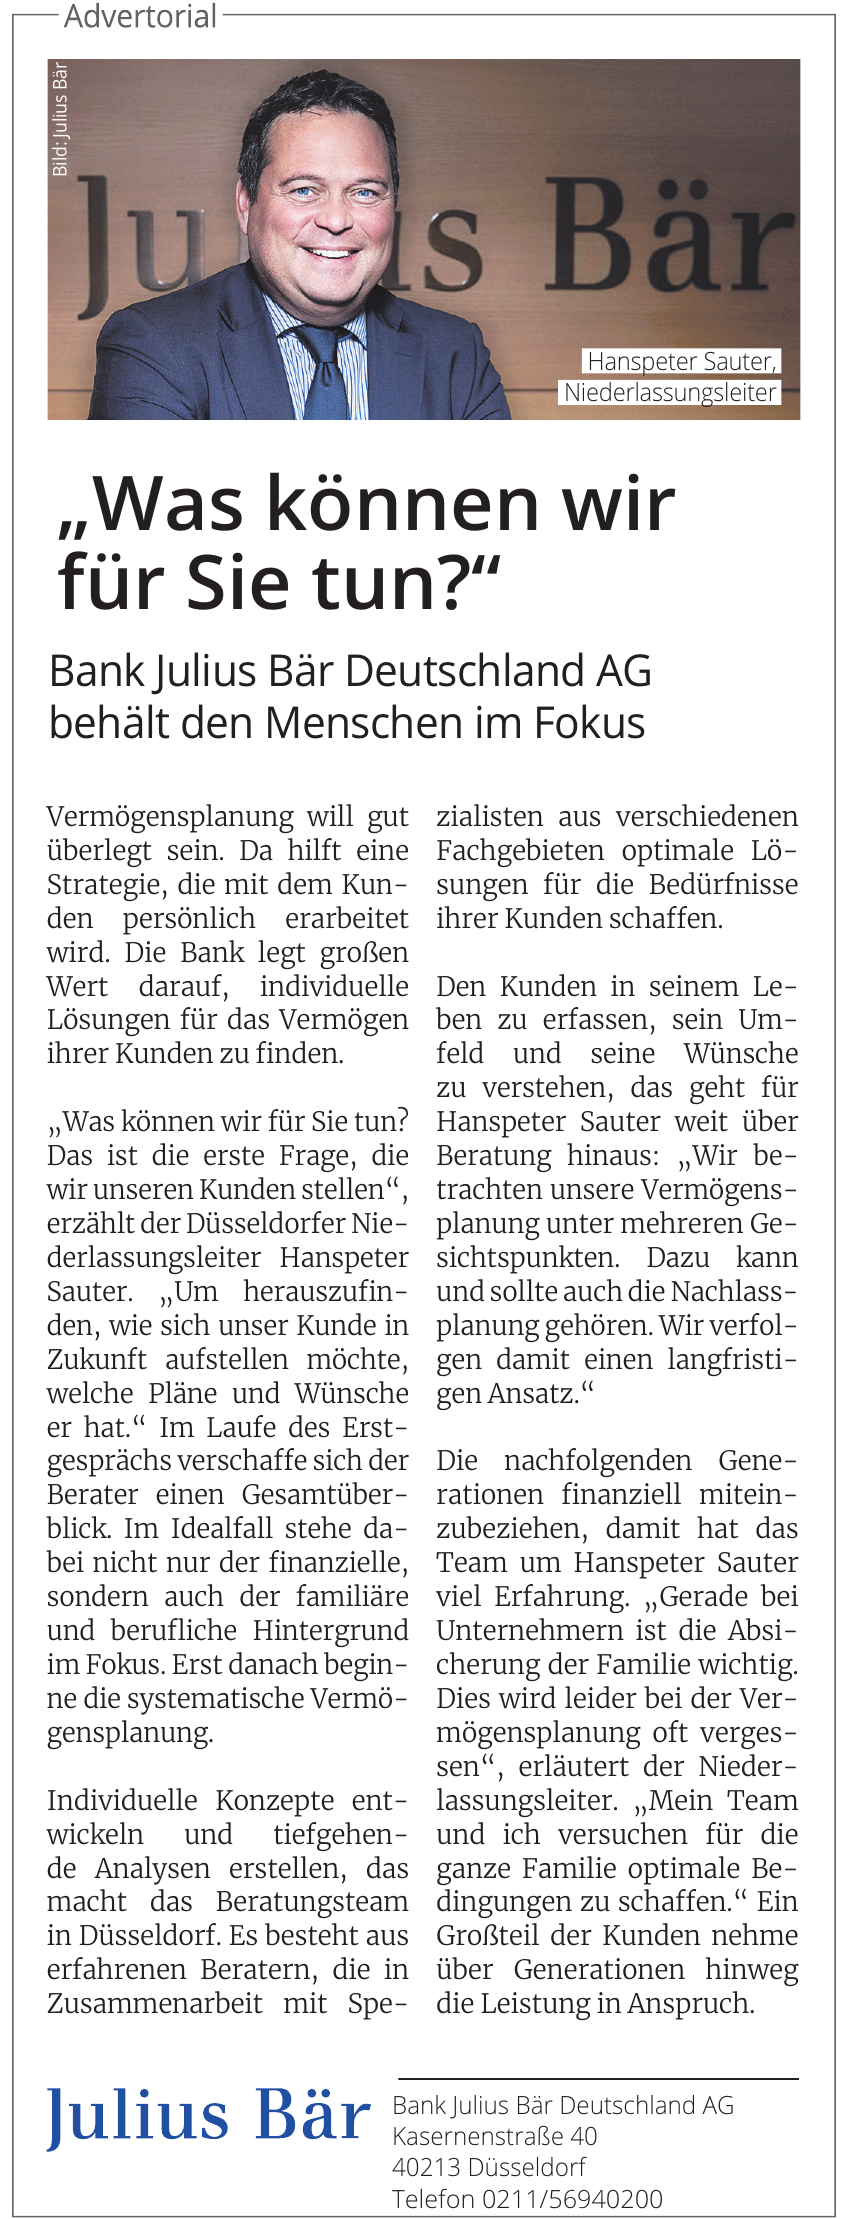 Bank Julius Bär Deutschland AG